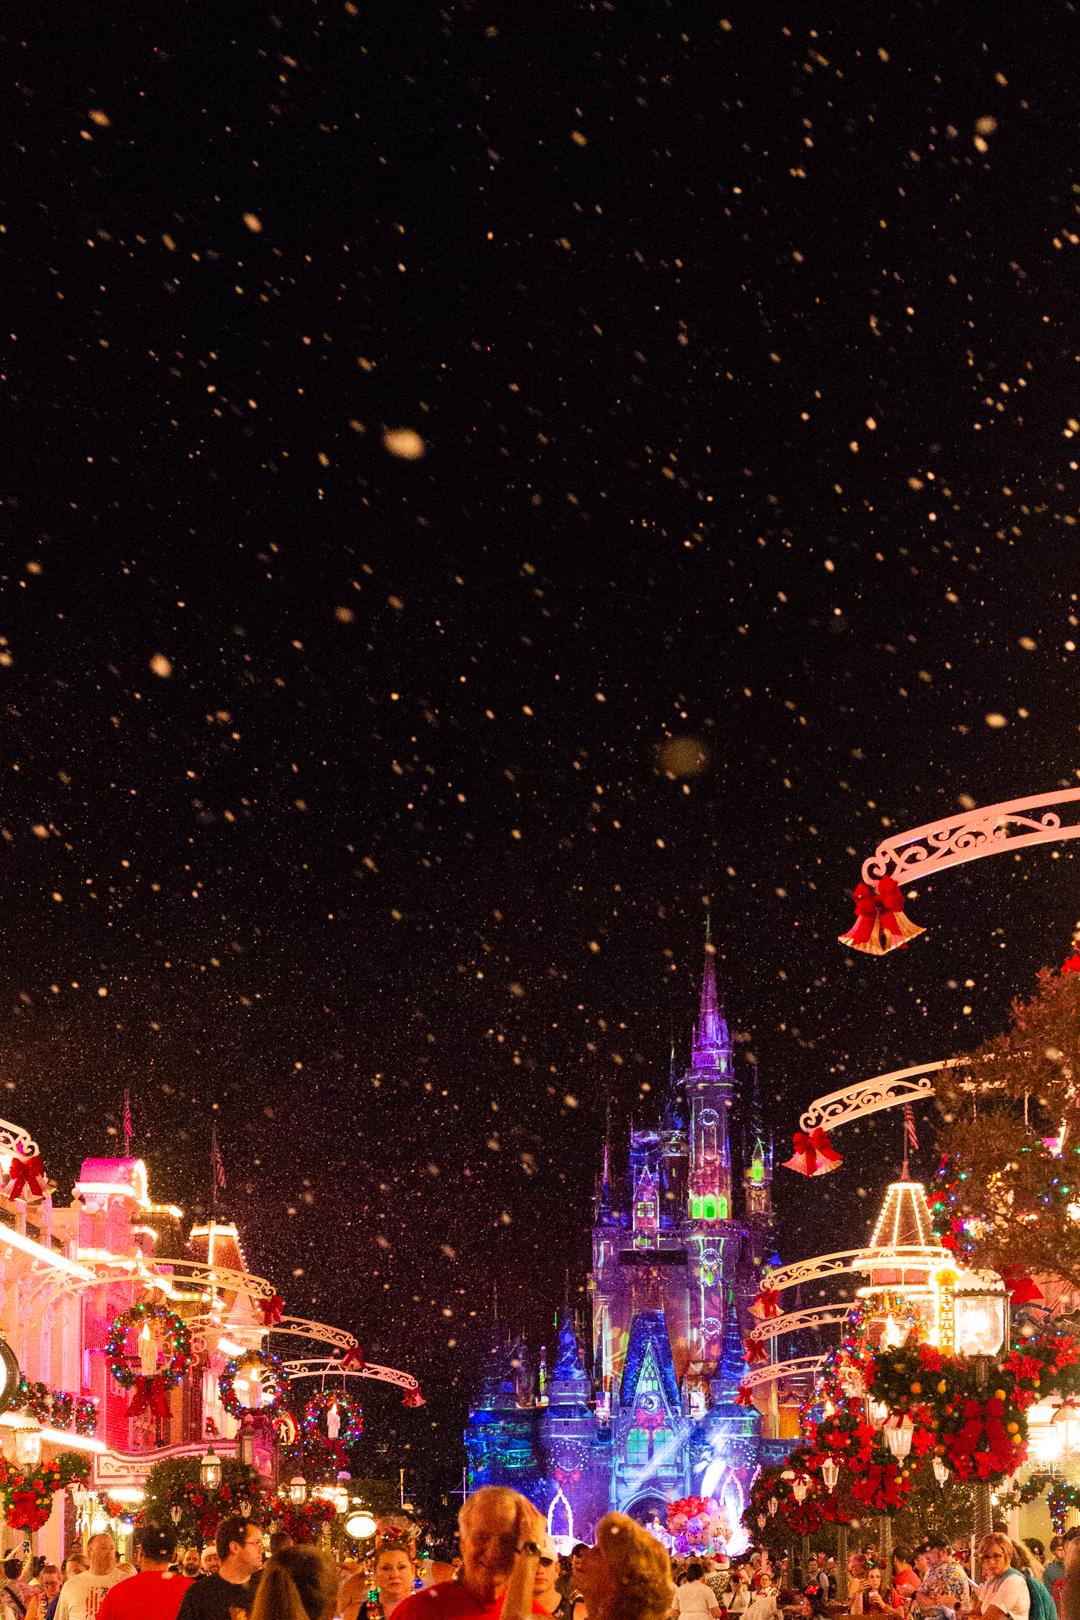 Cinderella's Castle at Walt Disney World at night.